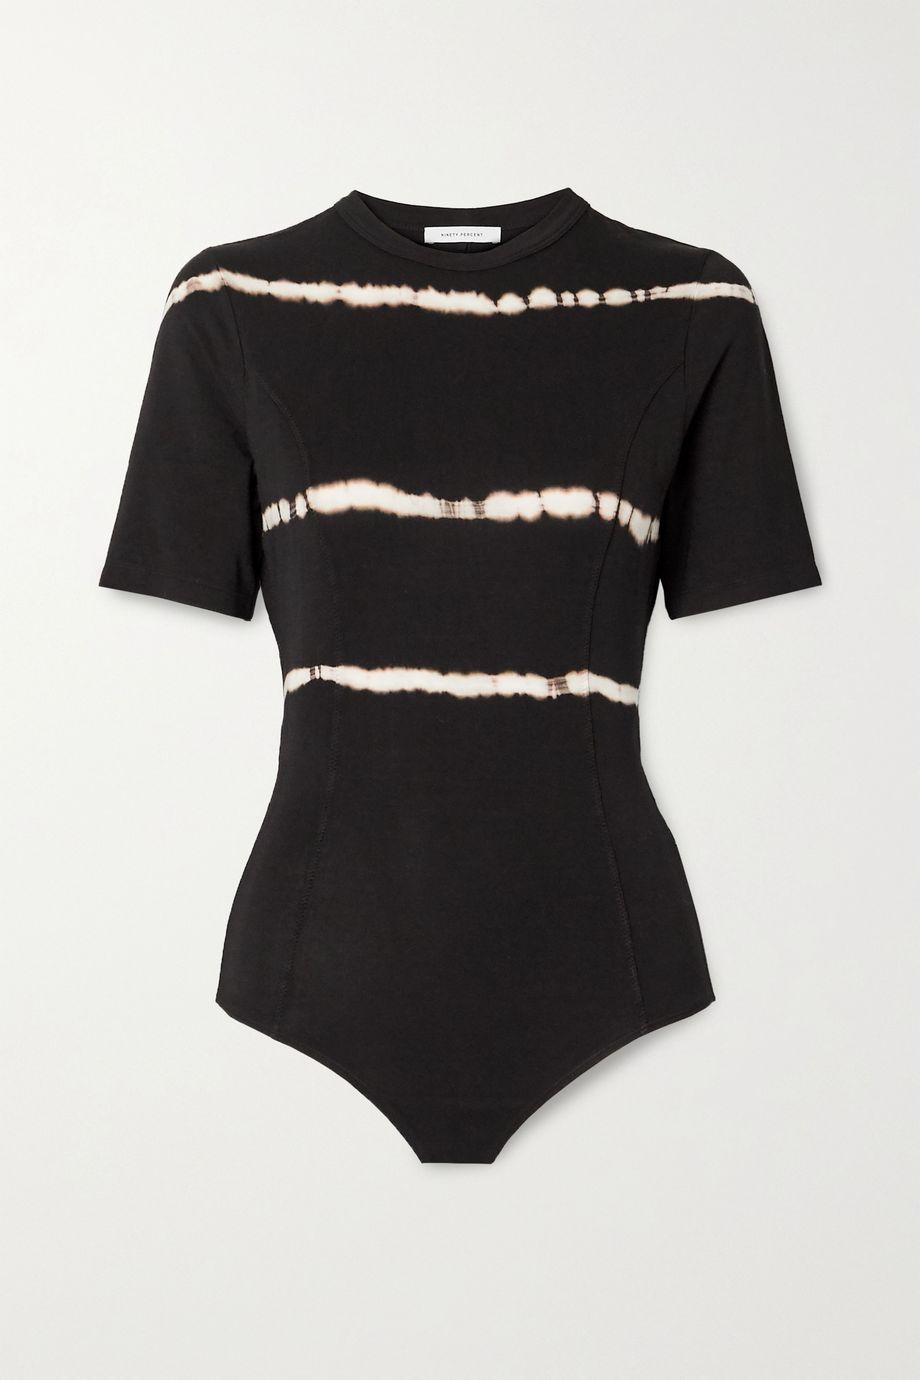 Ninety Percent Tie-dyed open-back stretch-Tencel bodysuit